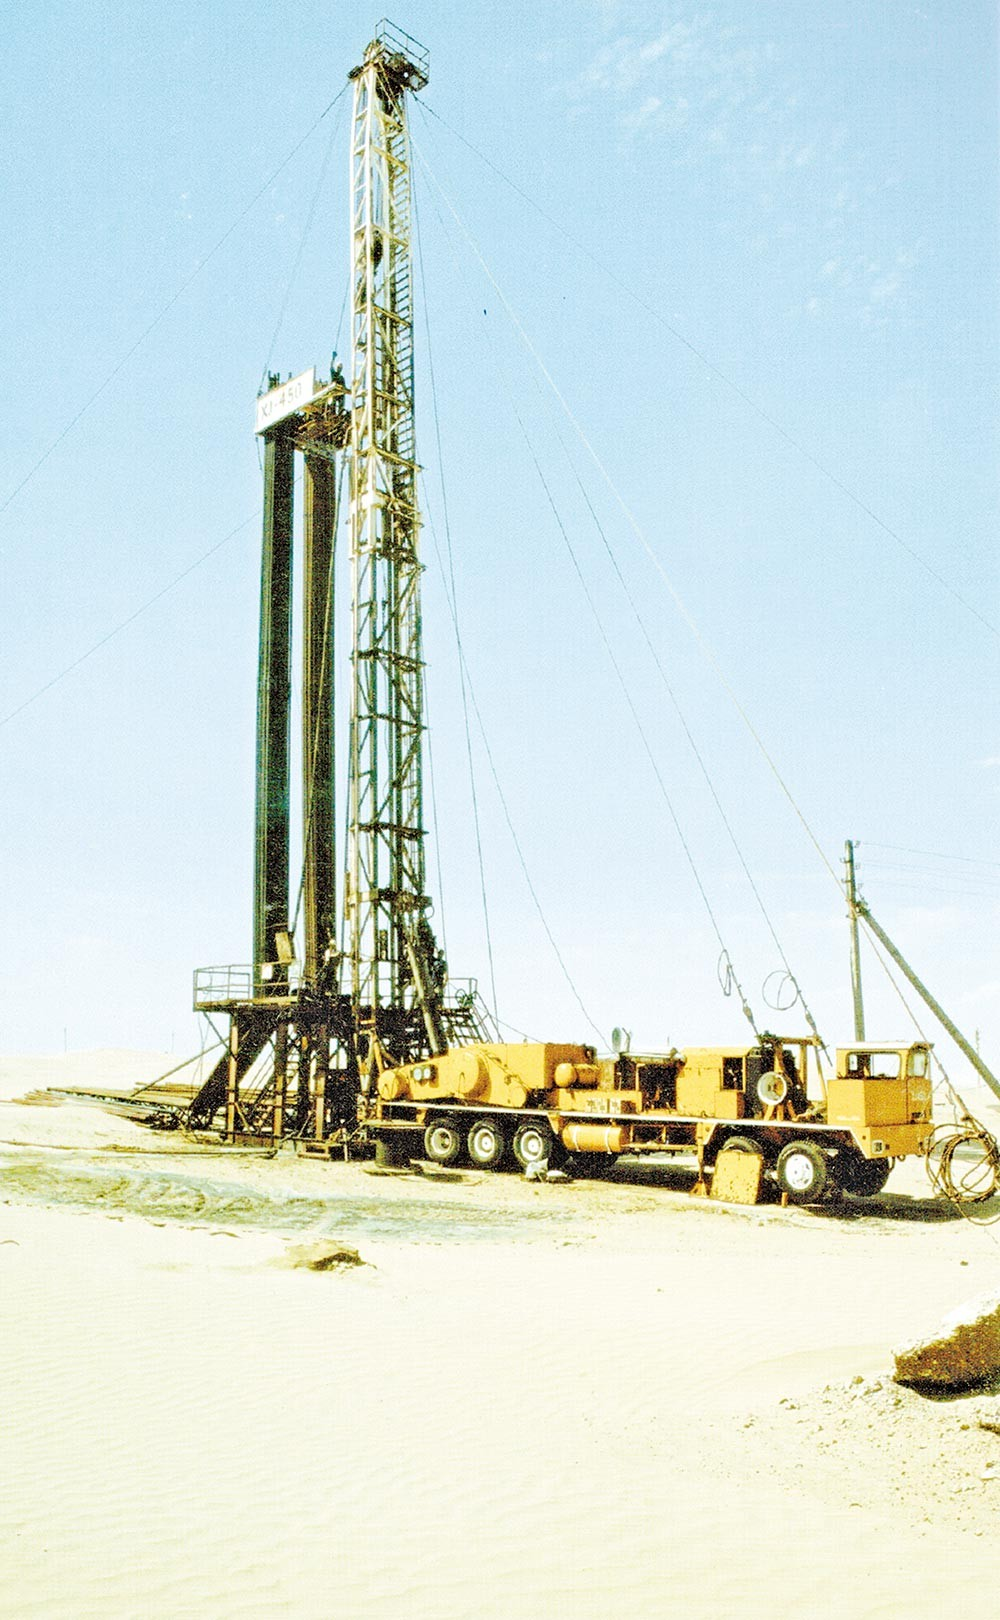 https://www.oilgas.gov.tm/storage/posts/2379/original-160c83f5b7fd8a.jpeg